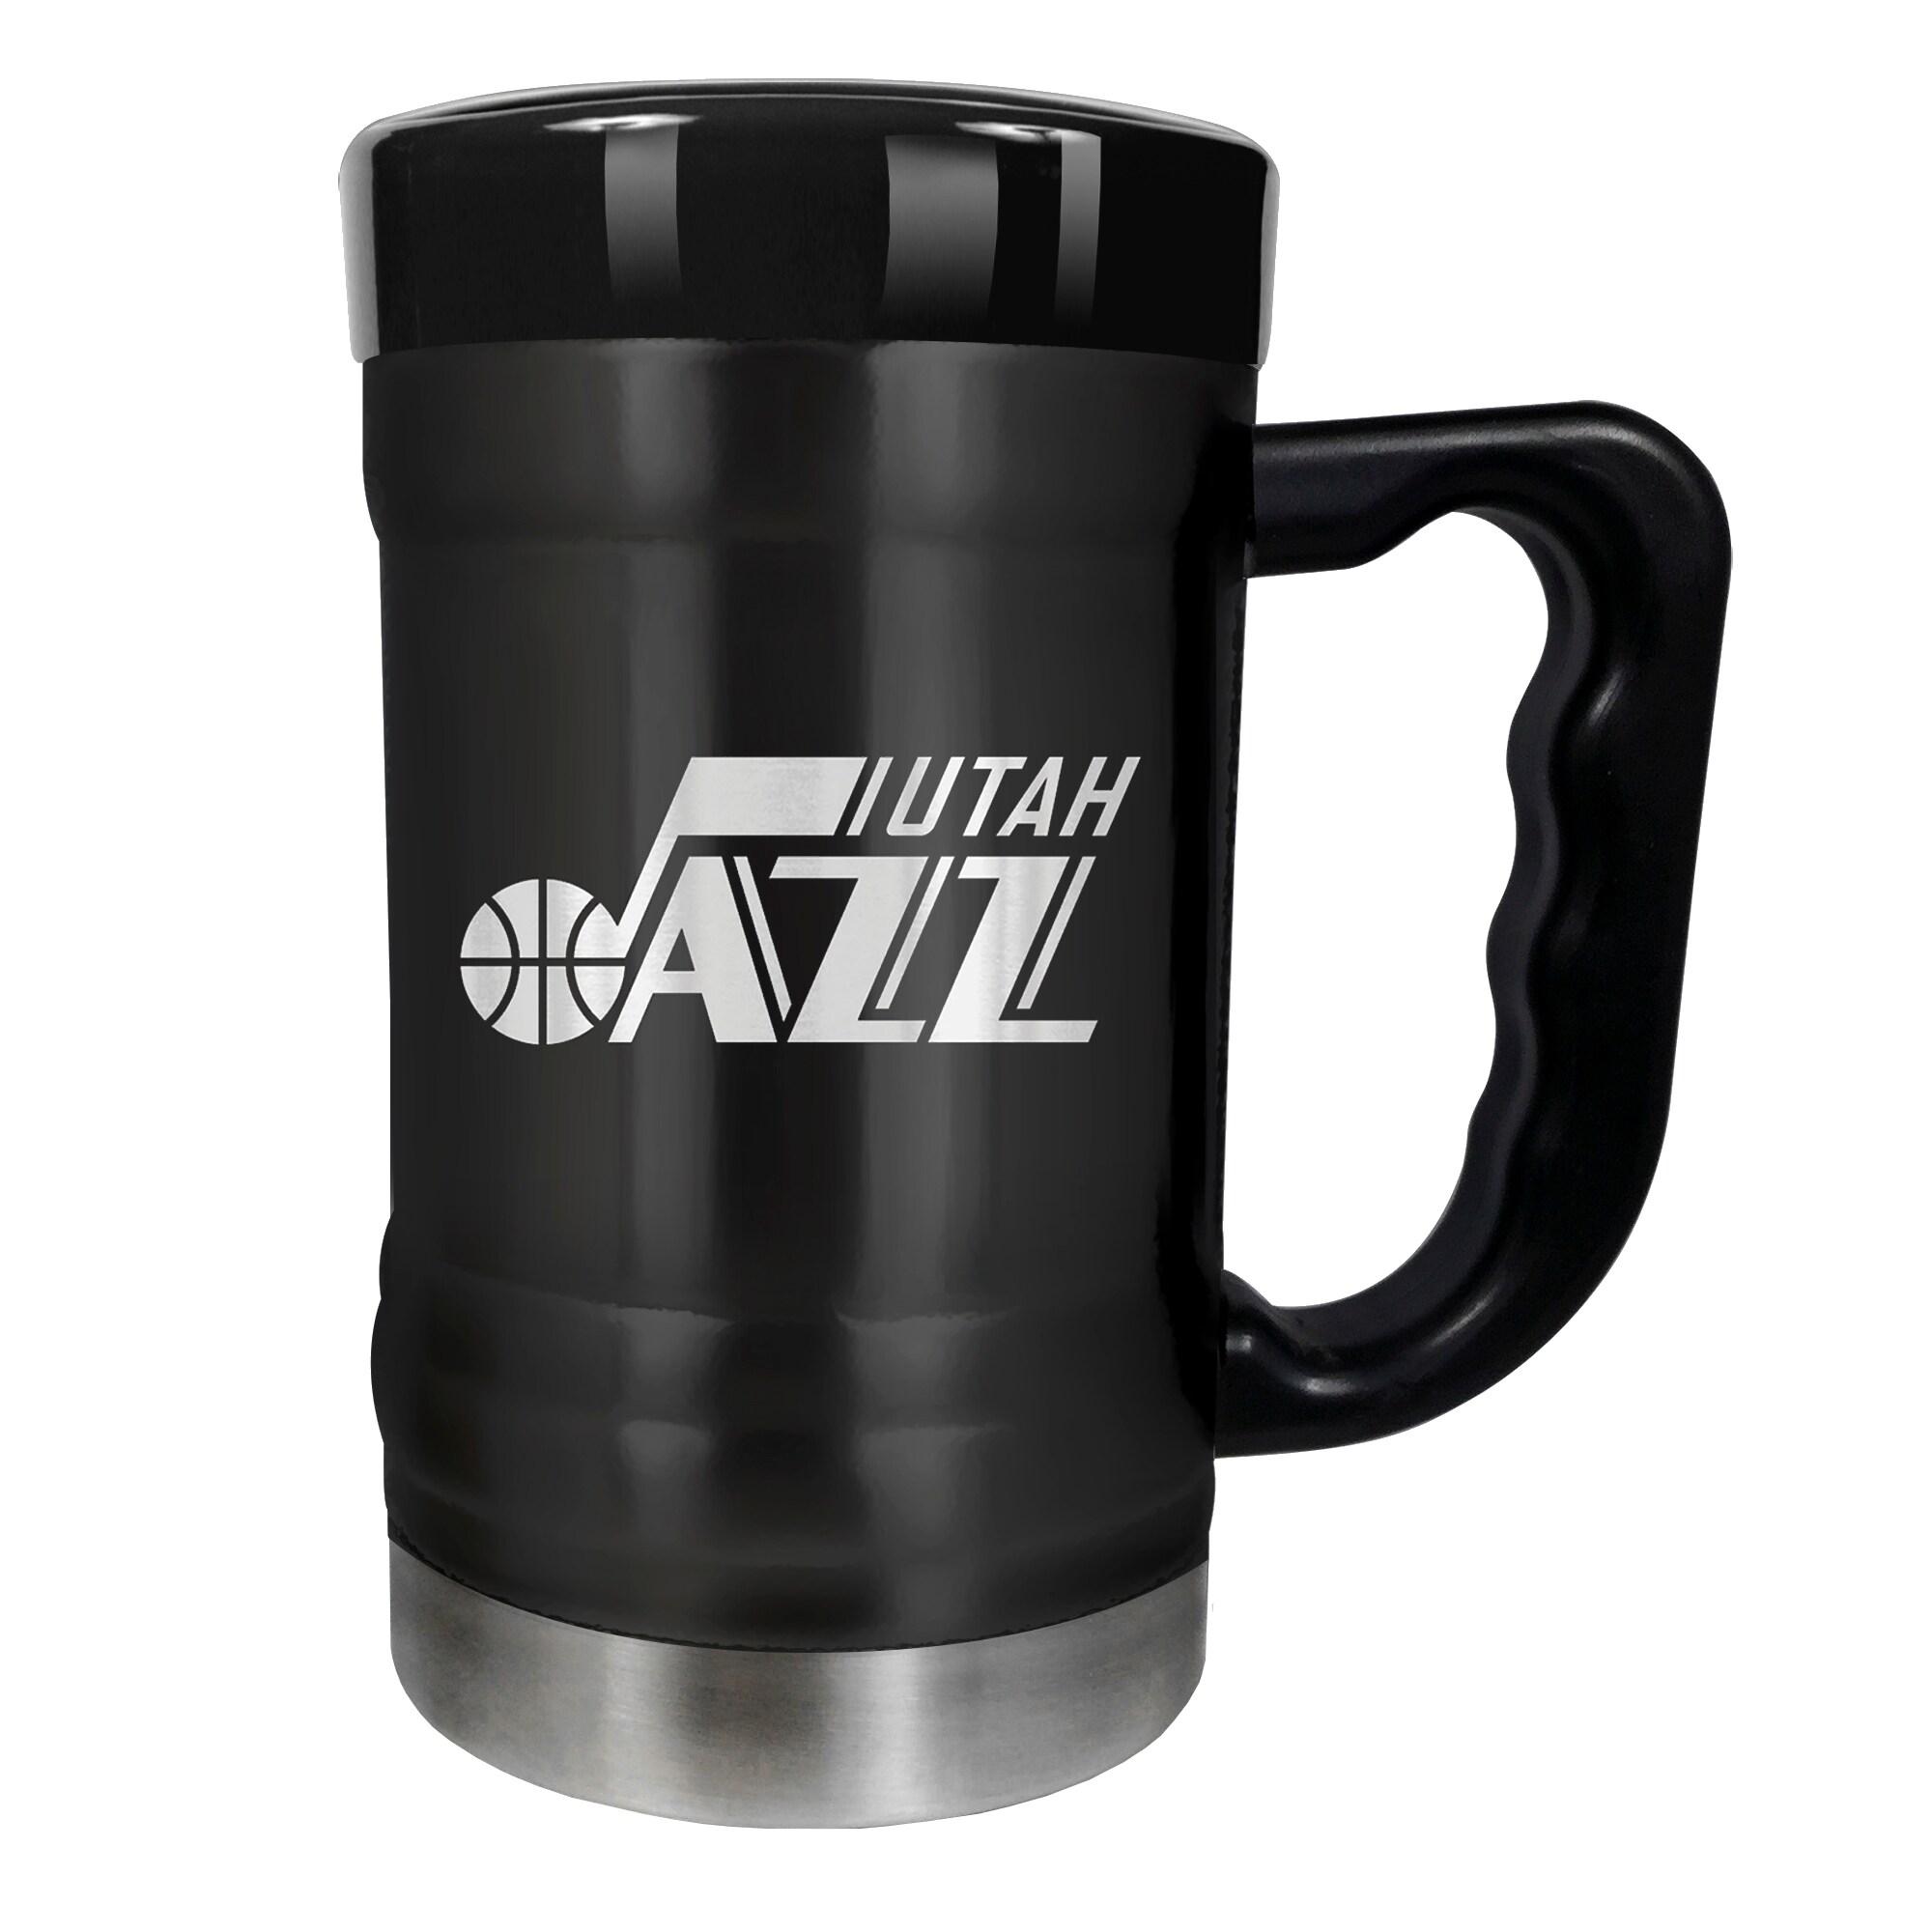 Utah Jazz 15oz. Stealth Coach Coffee Mug - Black